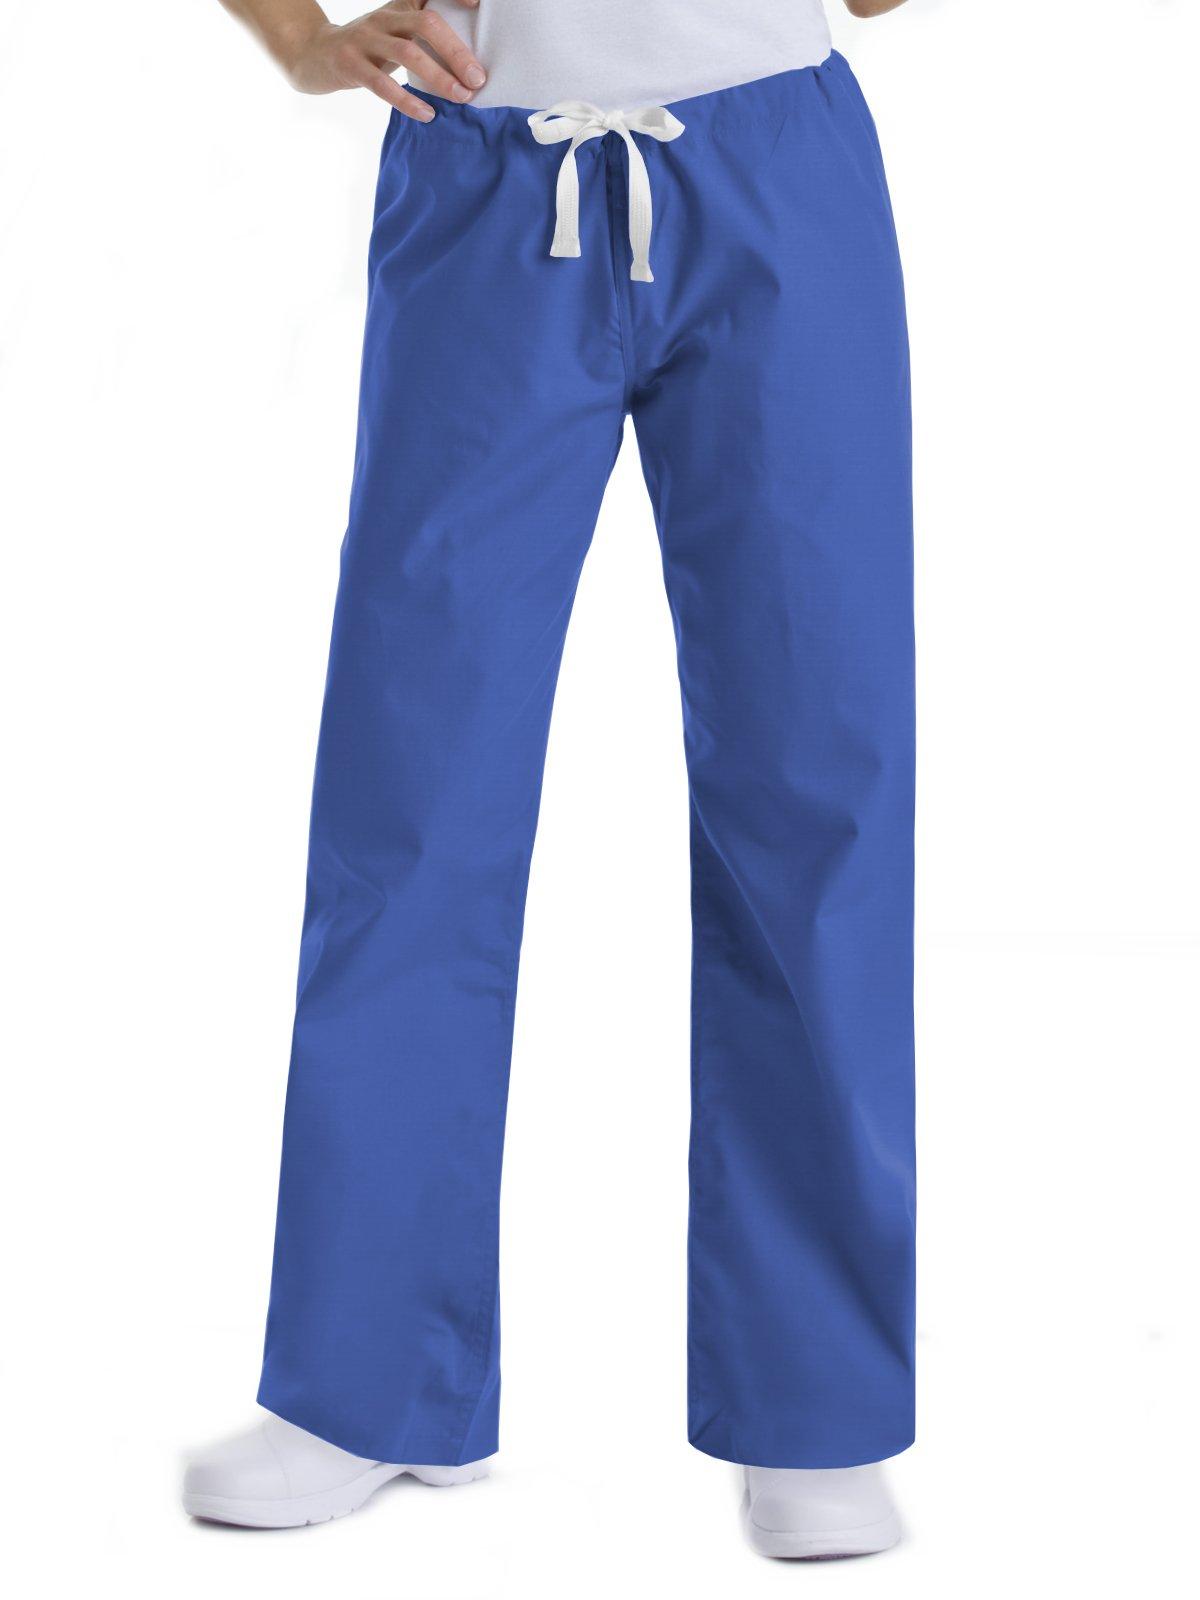 Urbane Essentials 9502 Relaxed Drawstring Pant Royal Blue SP